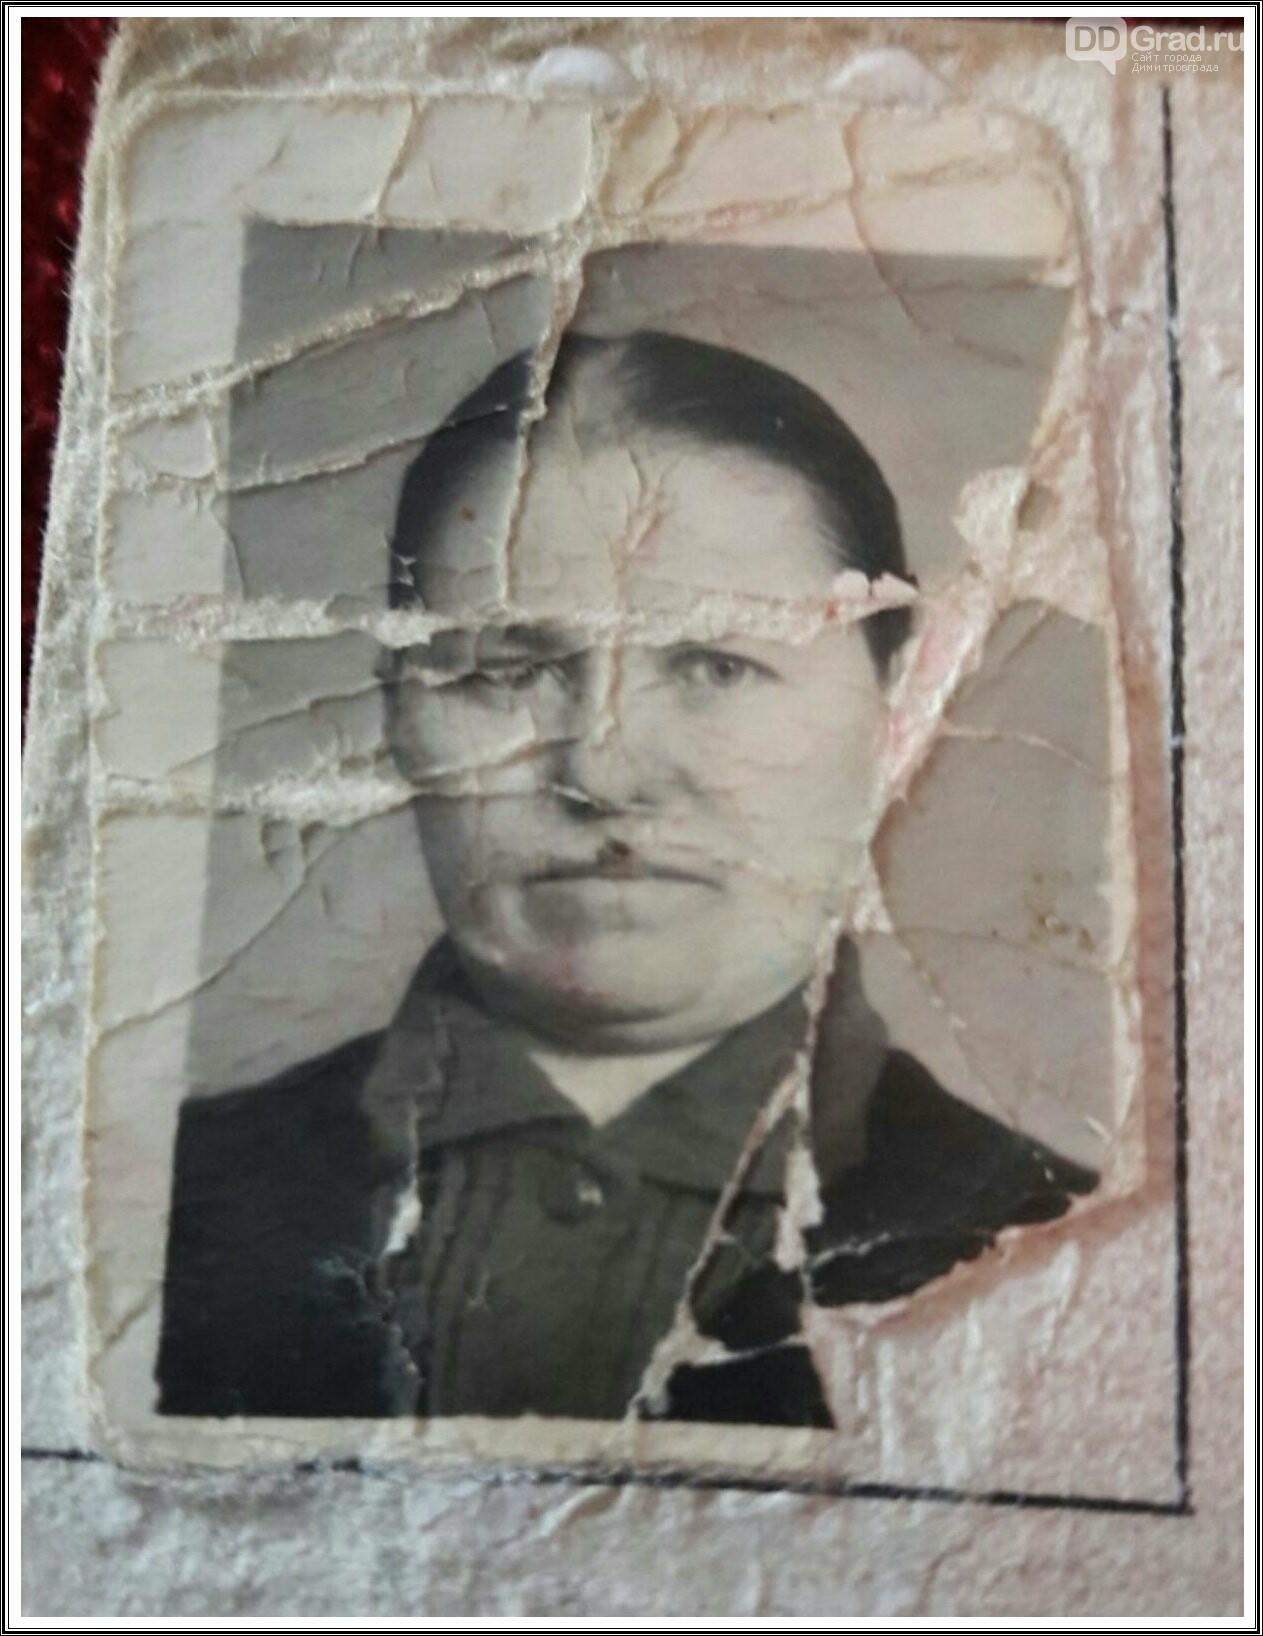 память через время димитровградка   Саванеева (Сидарочева)Ефросинья Григорьевна, фото-1